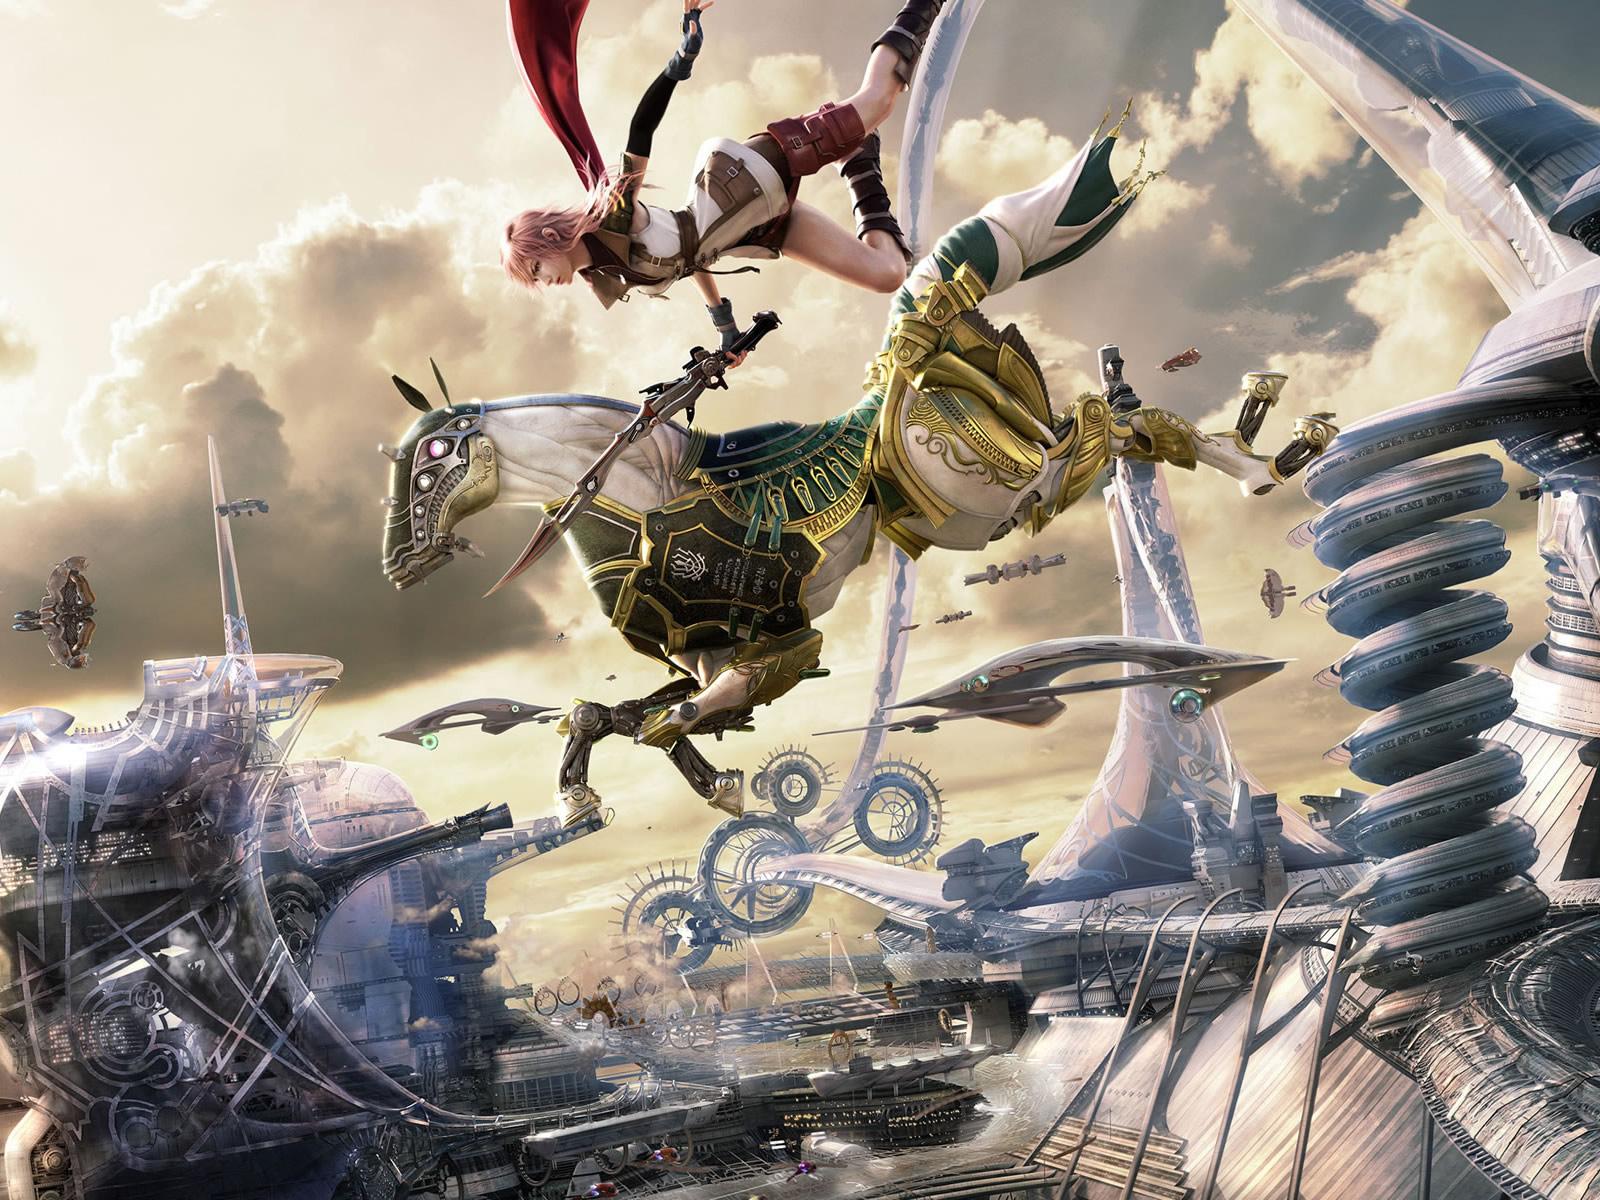 Video Game - Final Fantasy  Odin Lightning CGI Game Fantasy Wallpaper